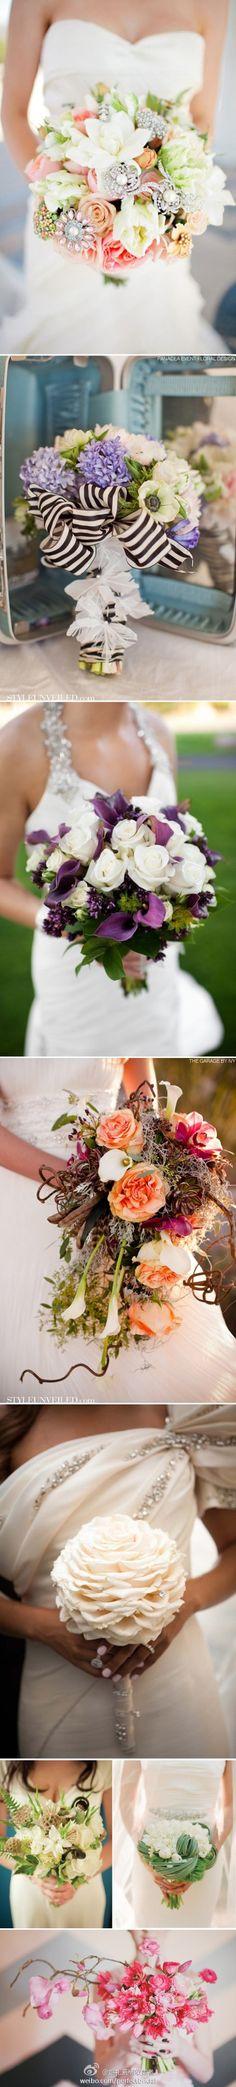 love the 3rd purple cali lilies/white rose boquet...gorgeous